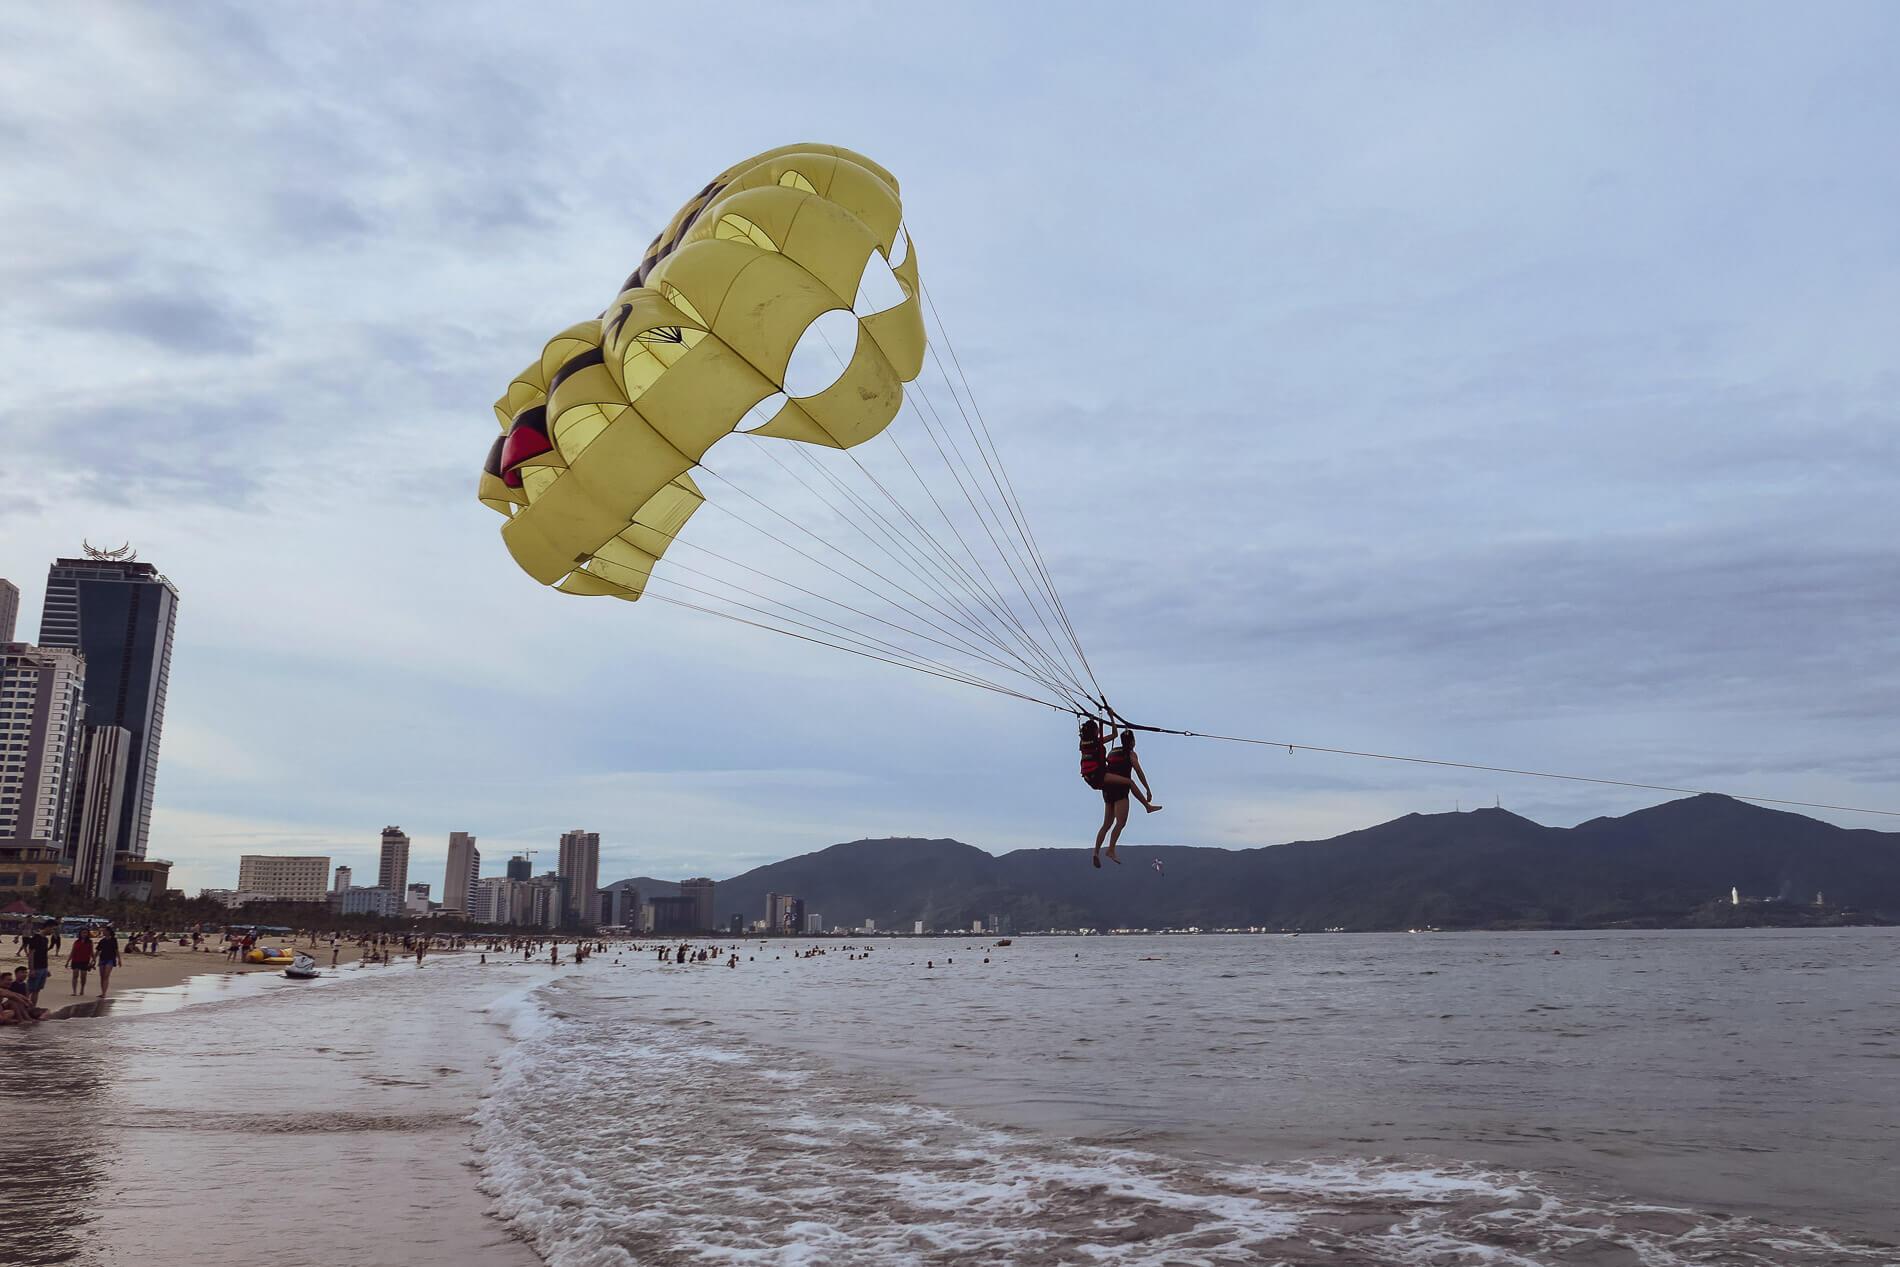 a parasailing ride at My Khe Beach